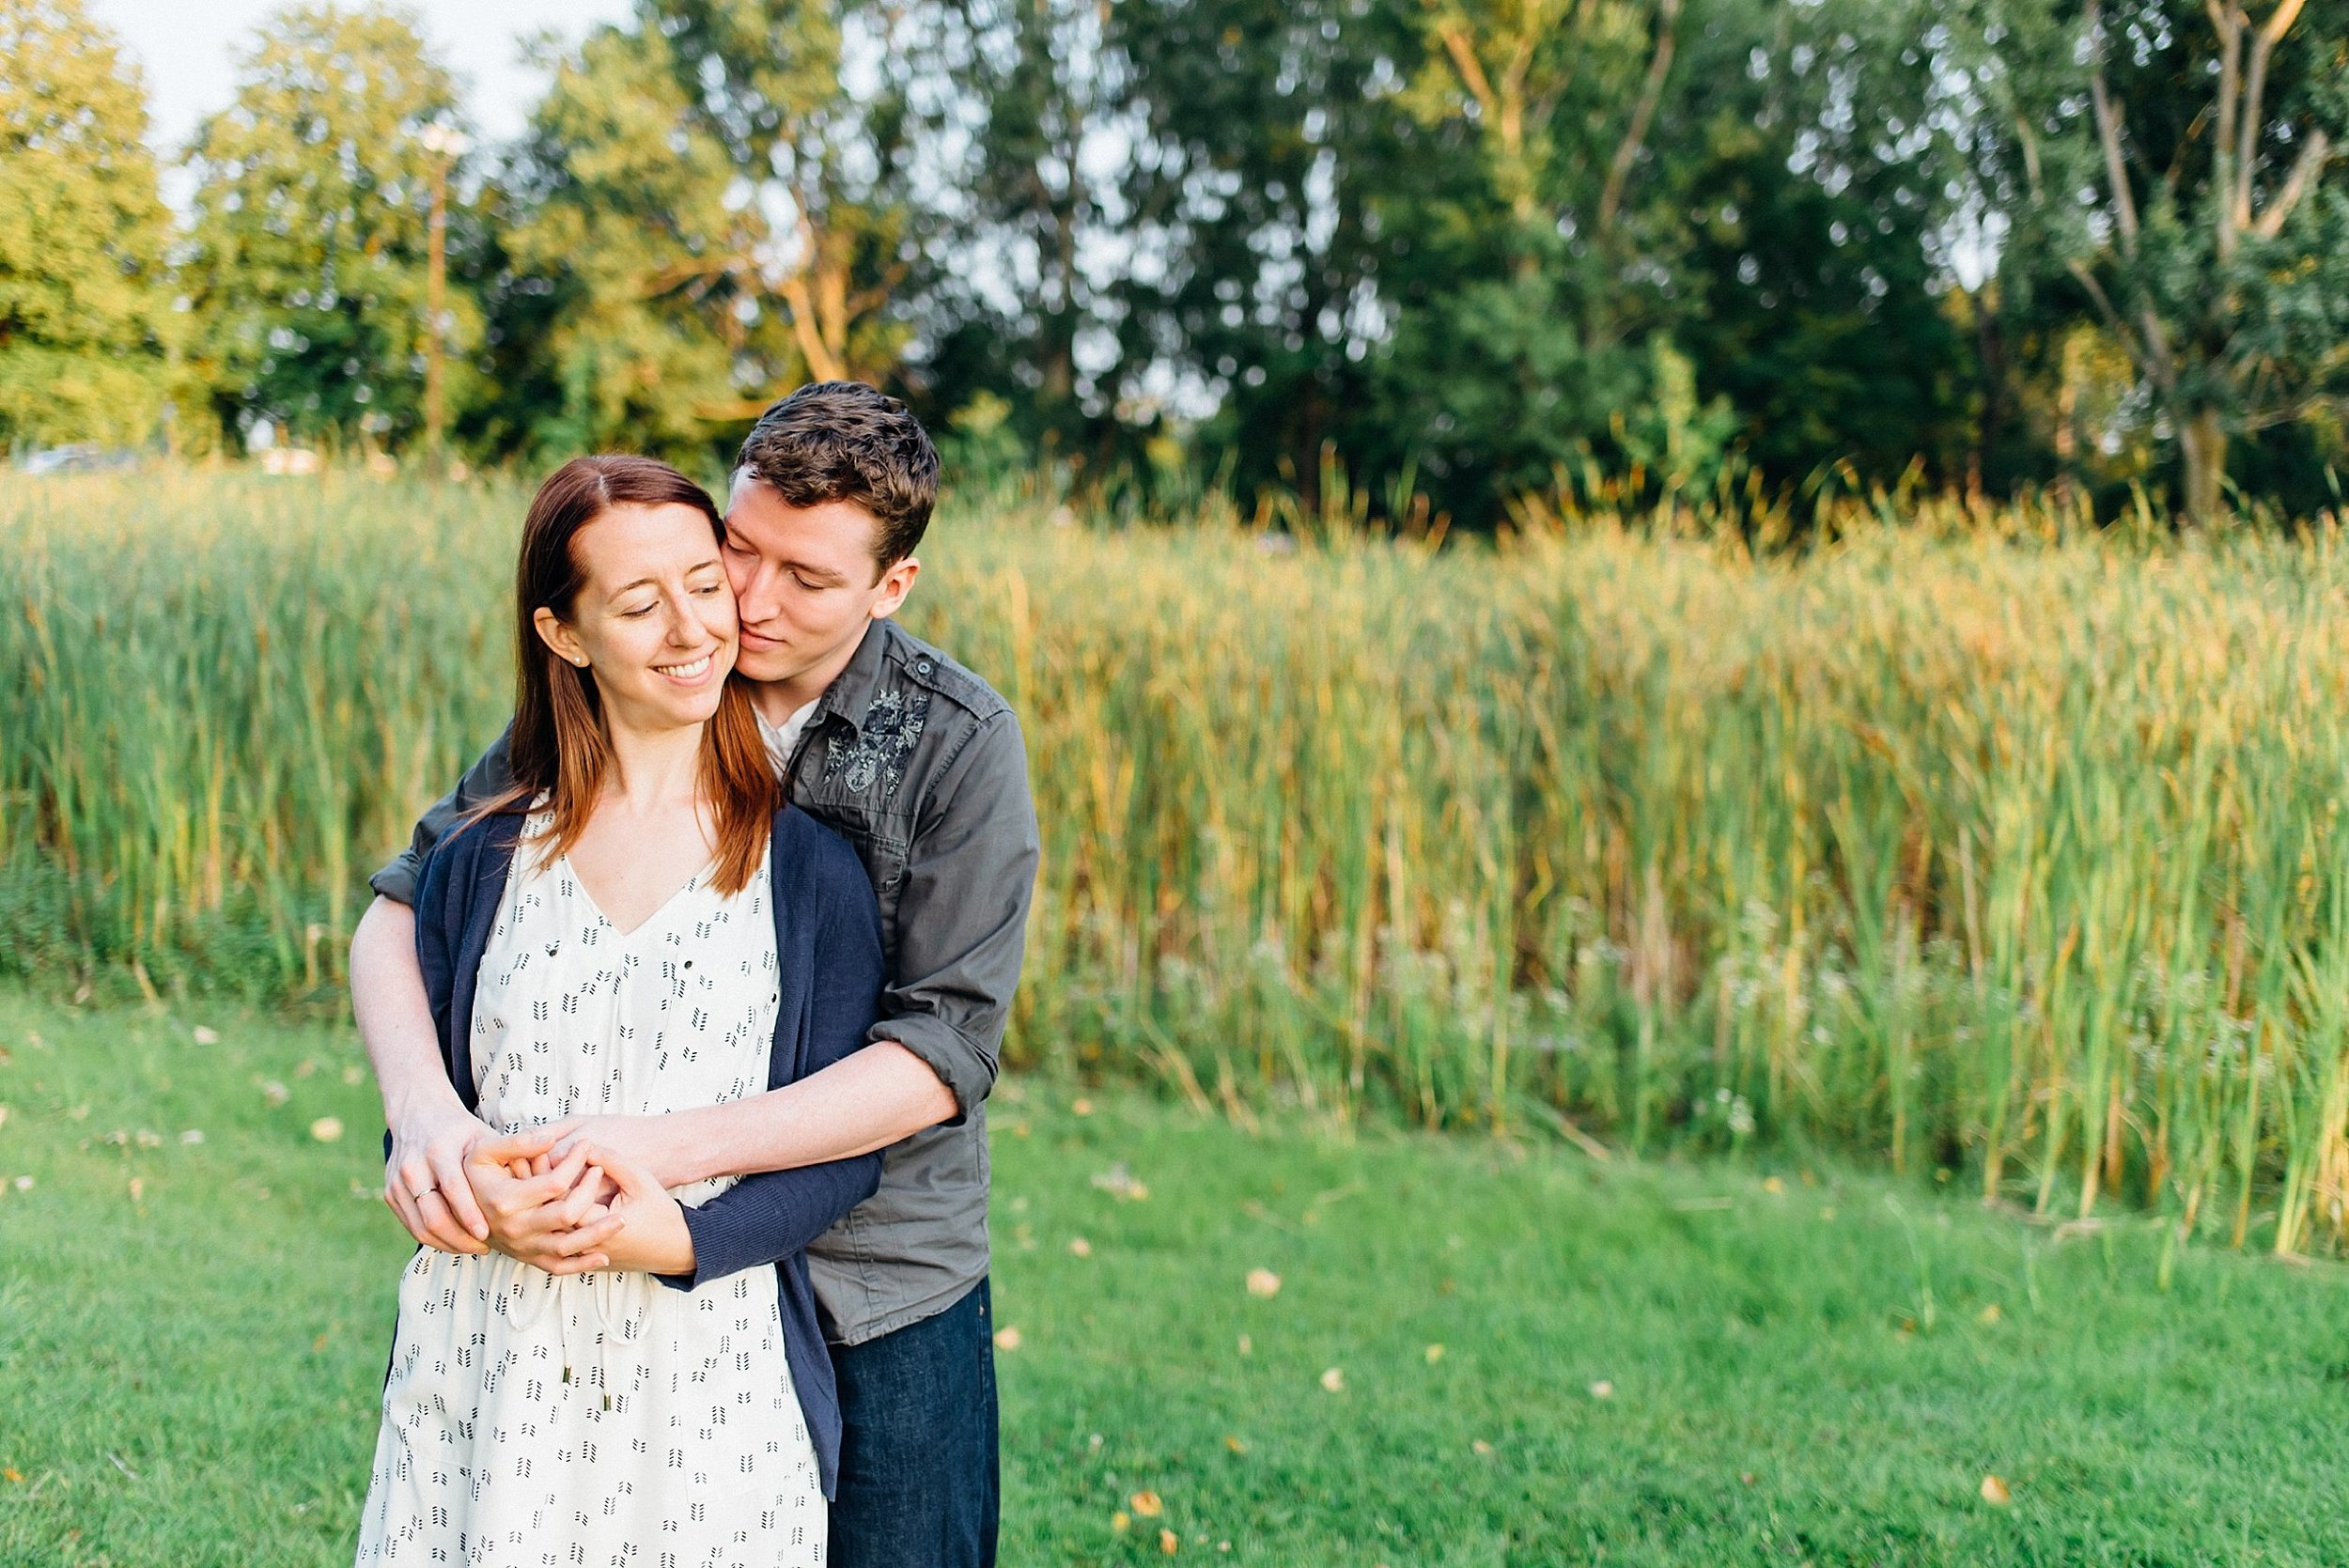 light, airy, fine art, documentary ottawa wedding photographer - best engagement photos 2017_0083.jpg